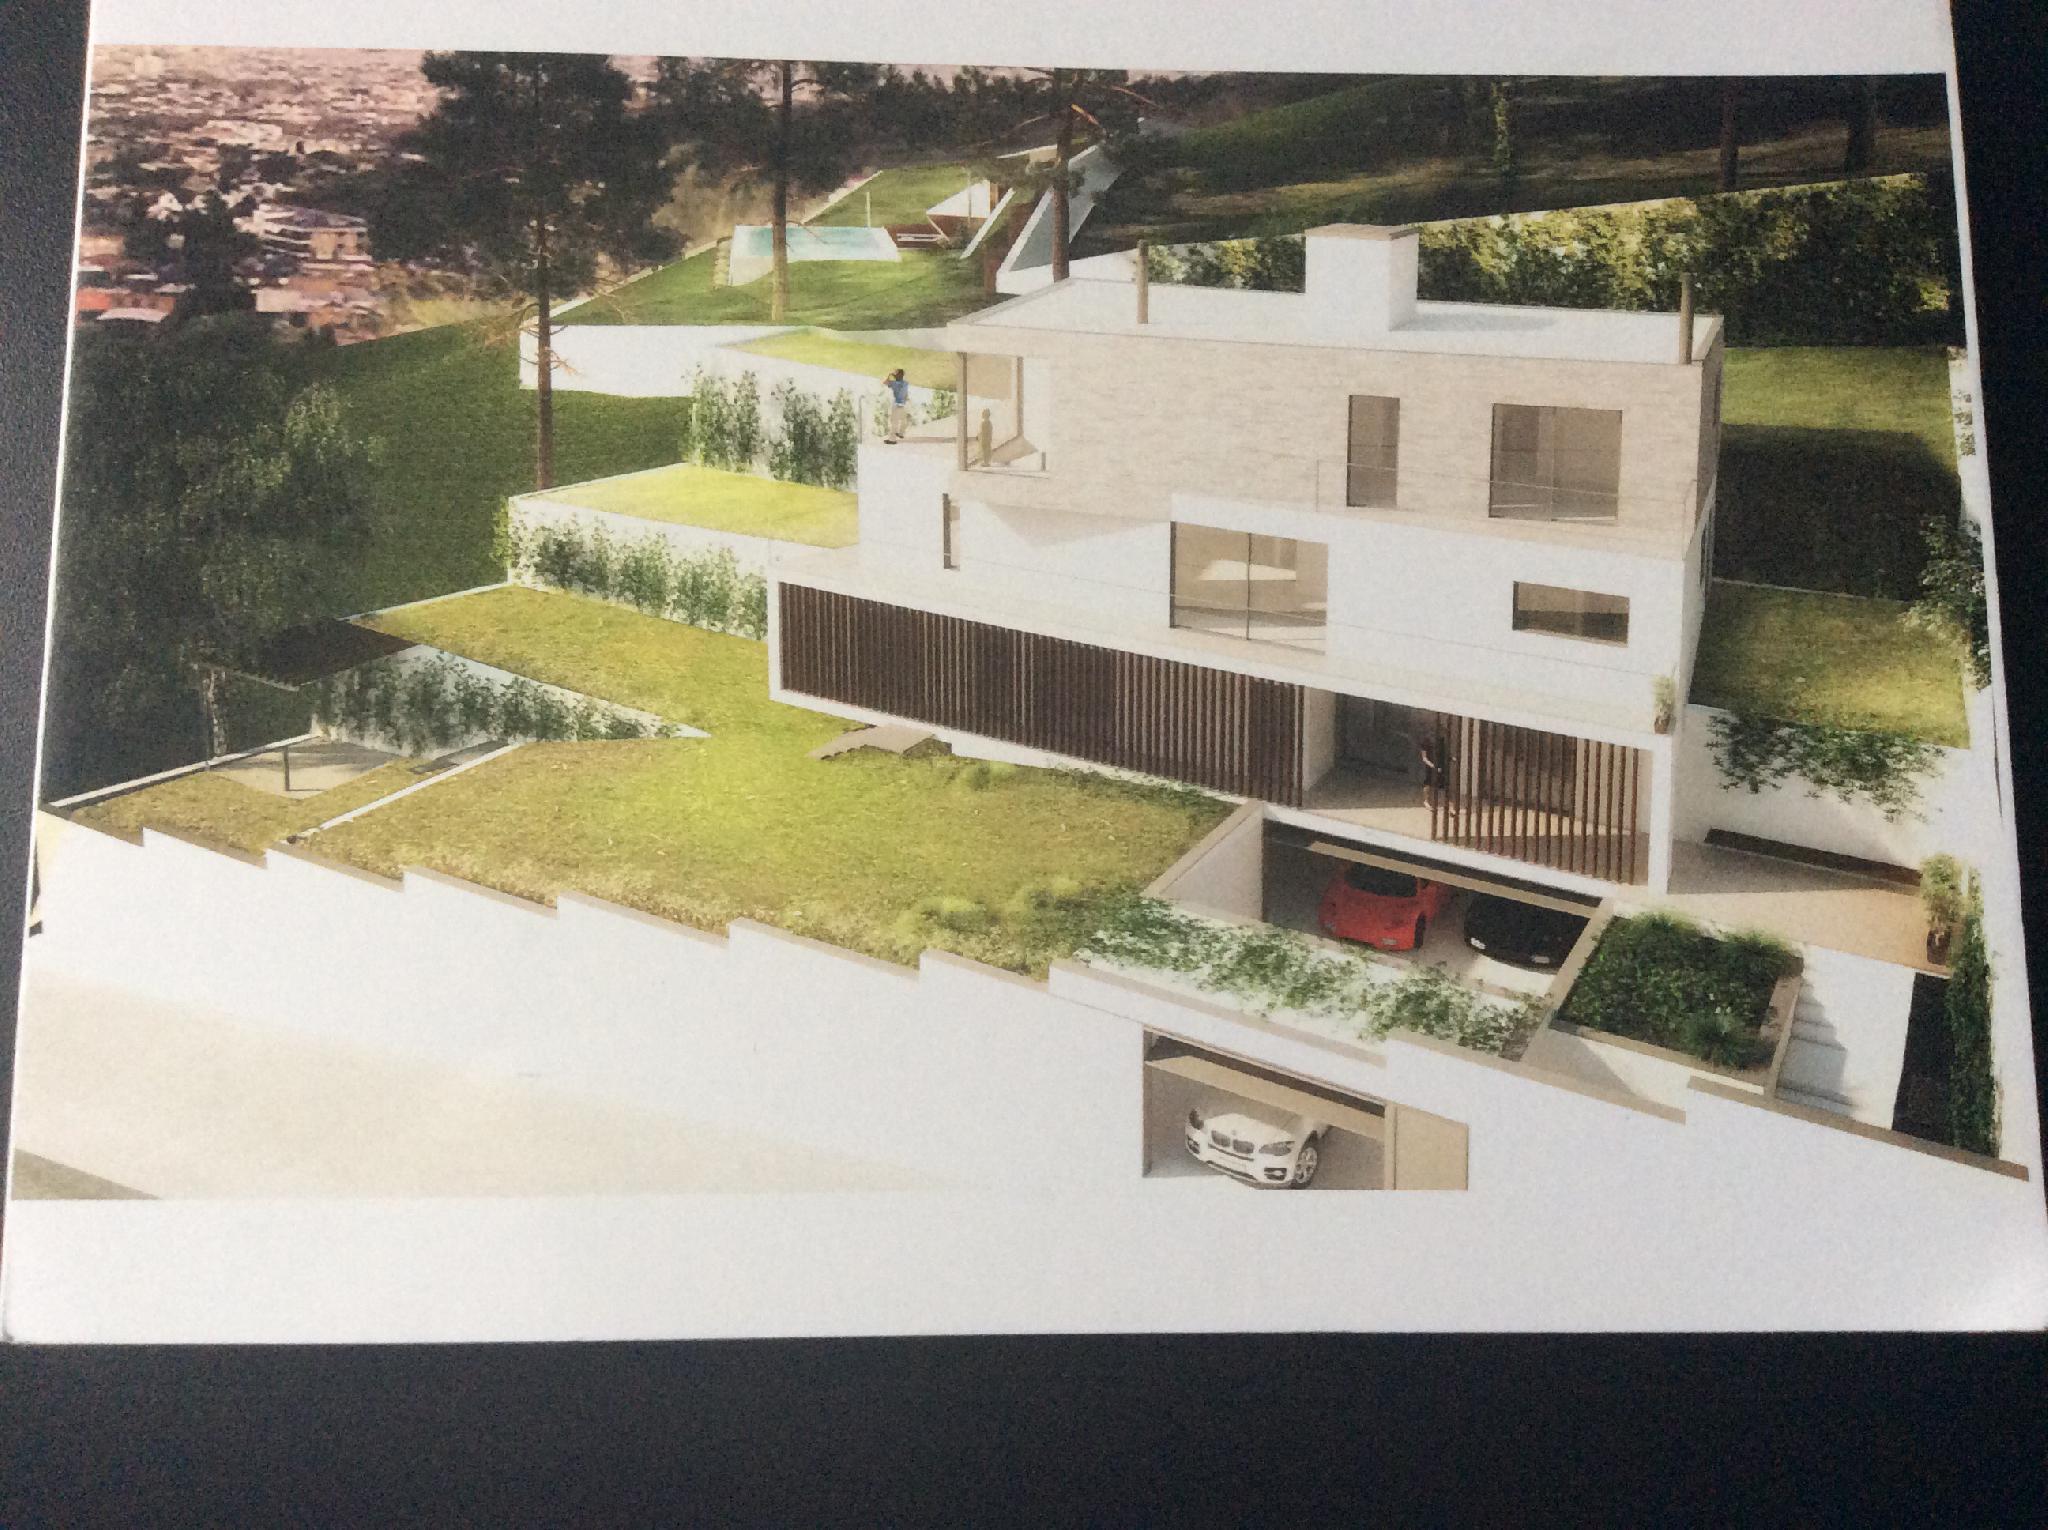 100069 Solar Urbano en venda en Sarrià-Sant Gervasi, Tres Torres 3